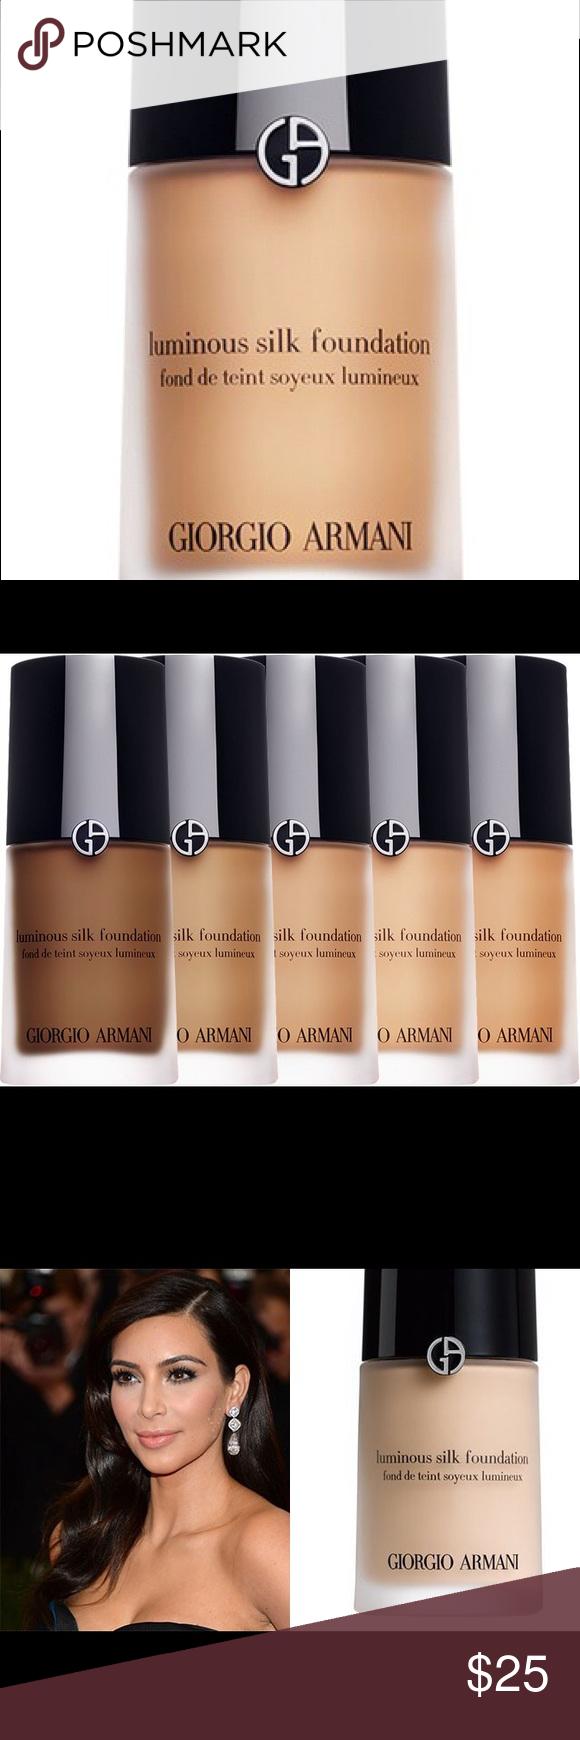 Giorgio Armani Luminous Silk Foundation 6 0 Giorgio Armani Luminous Silk Luminous Silk Foundation Giorgio Armani Makeup